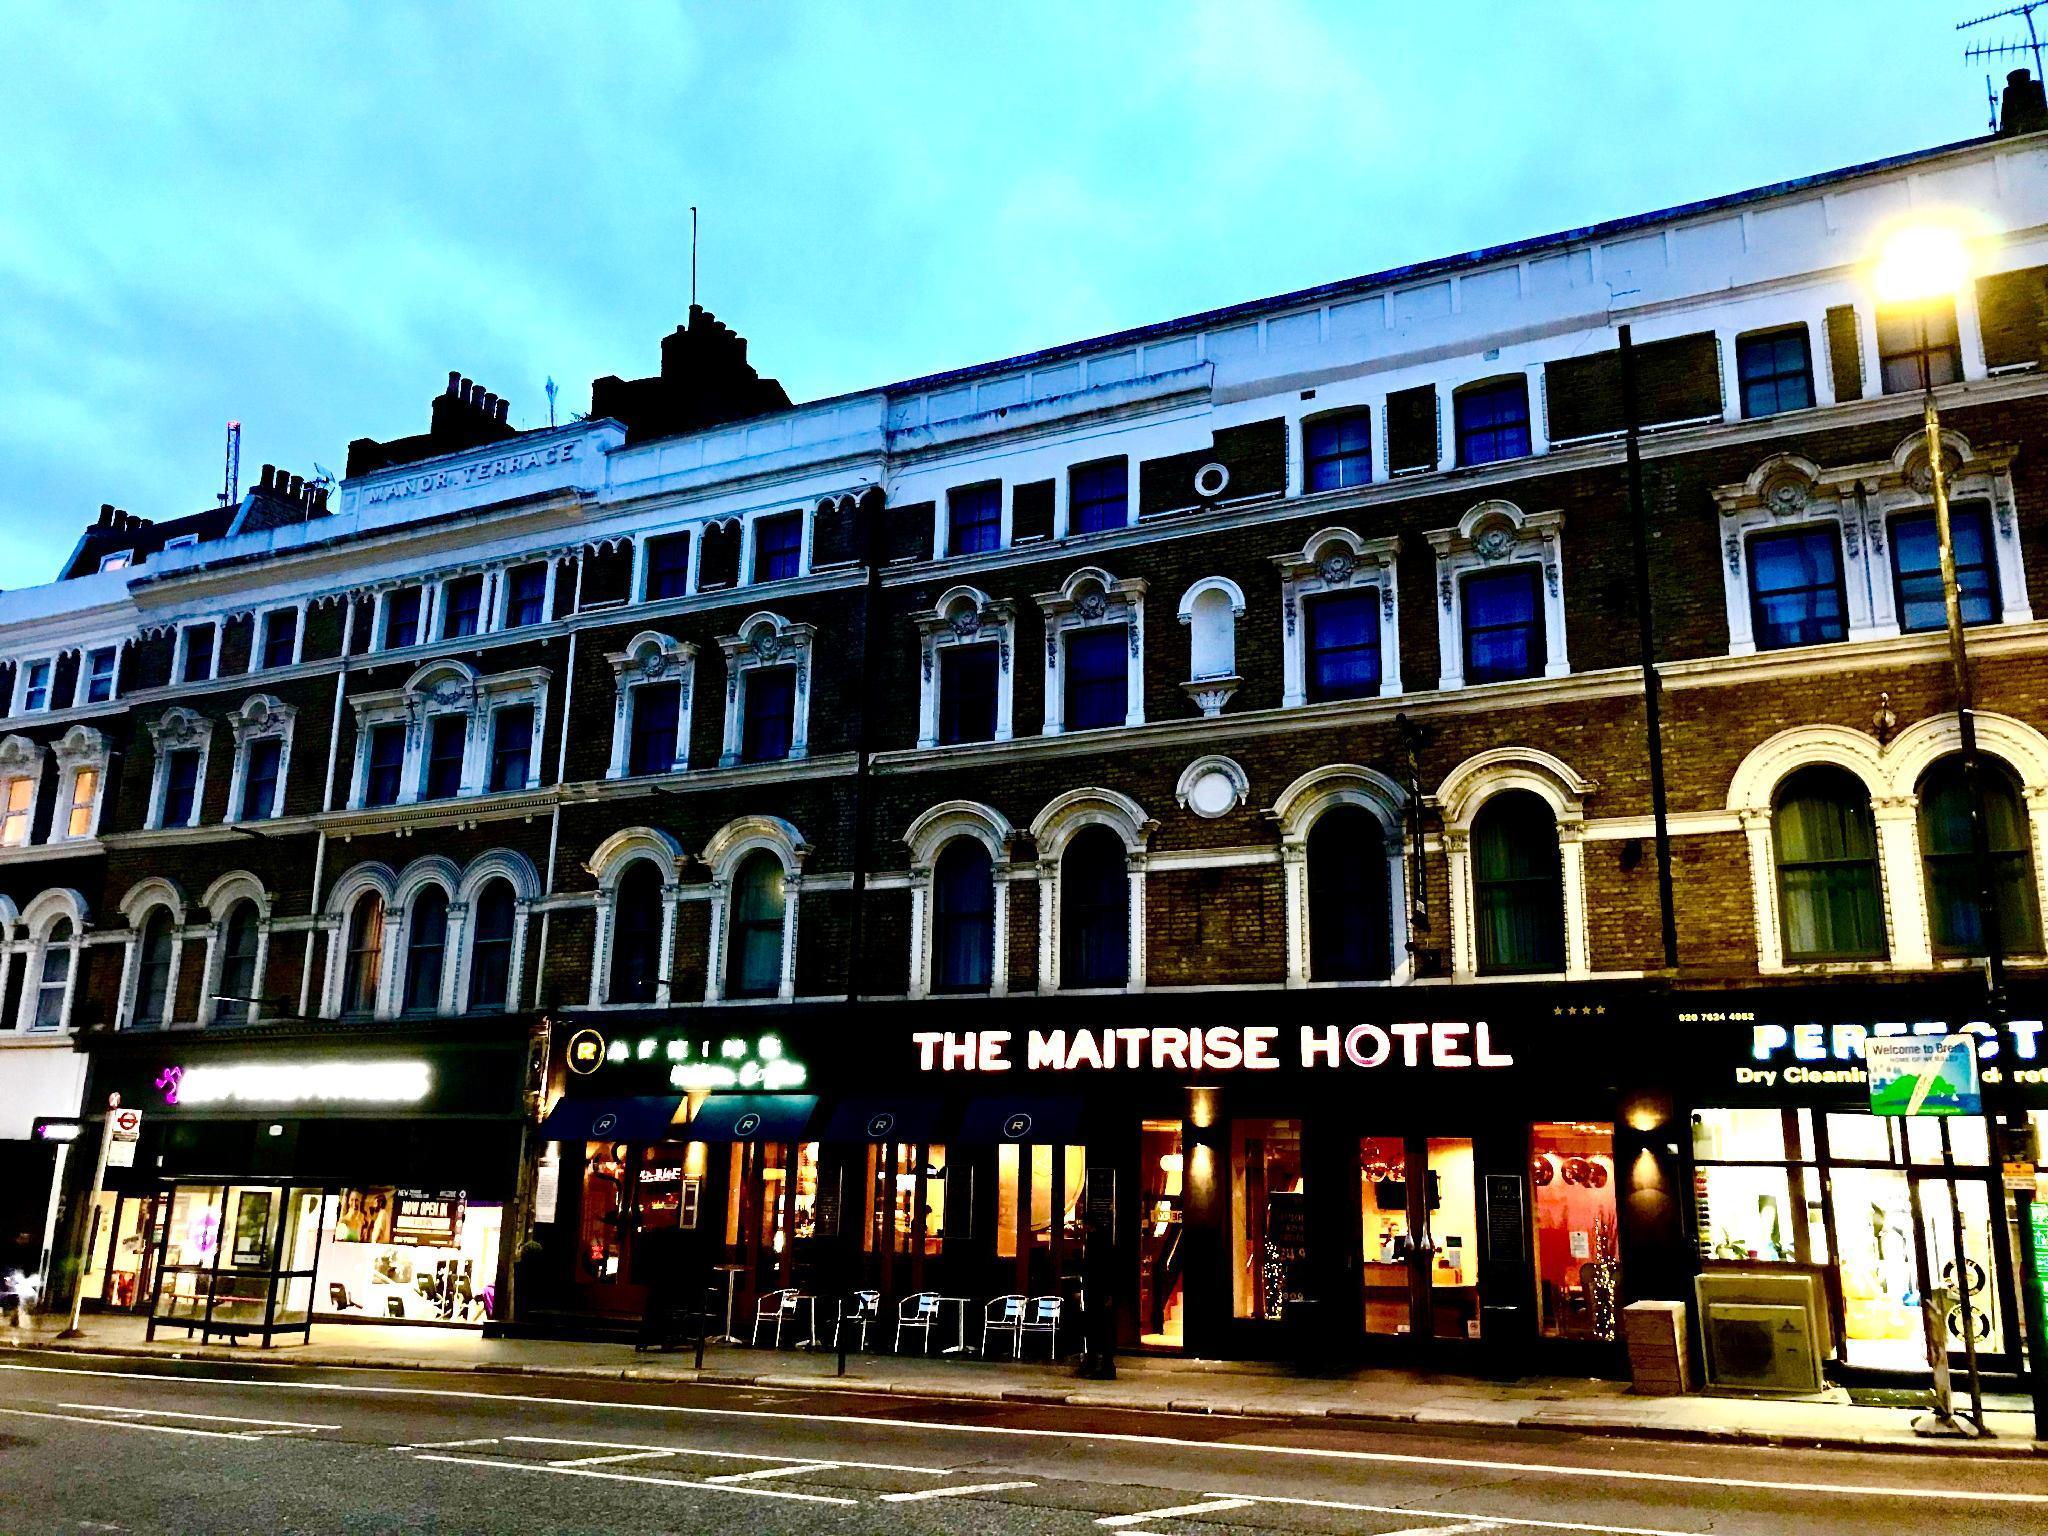 Maitrise Hotel Maida Vale London, London